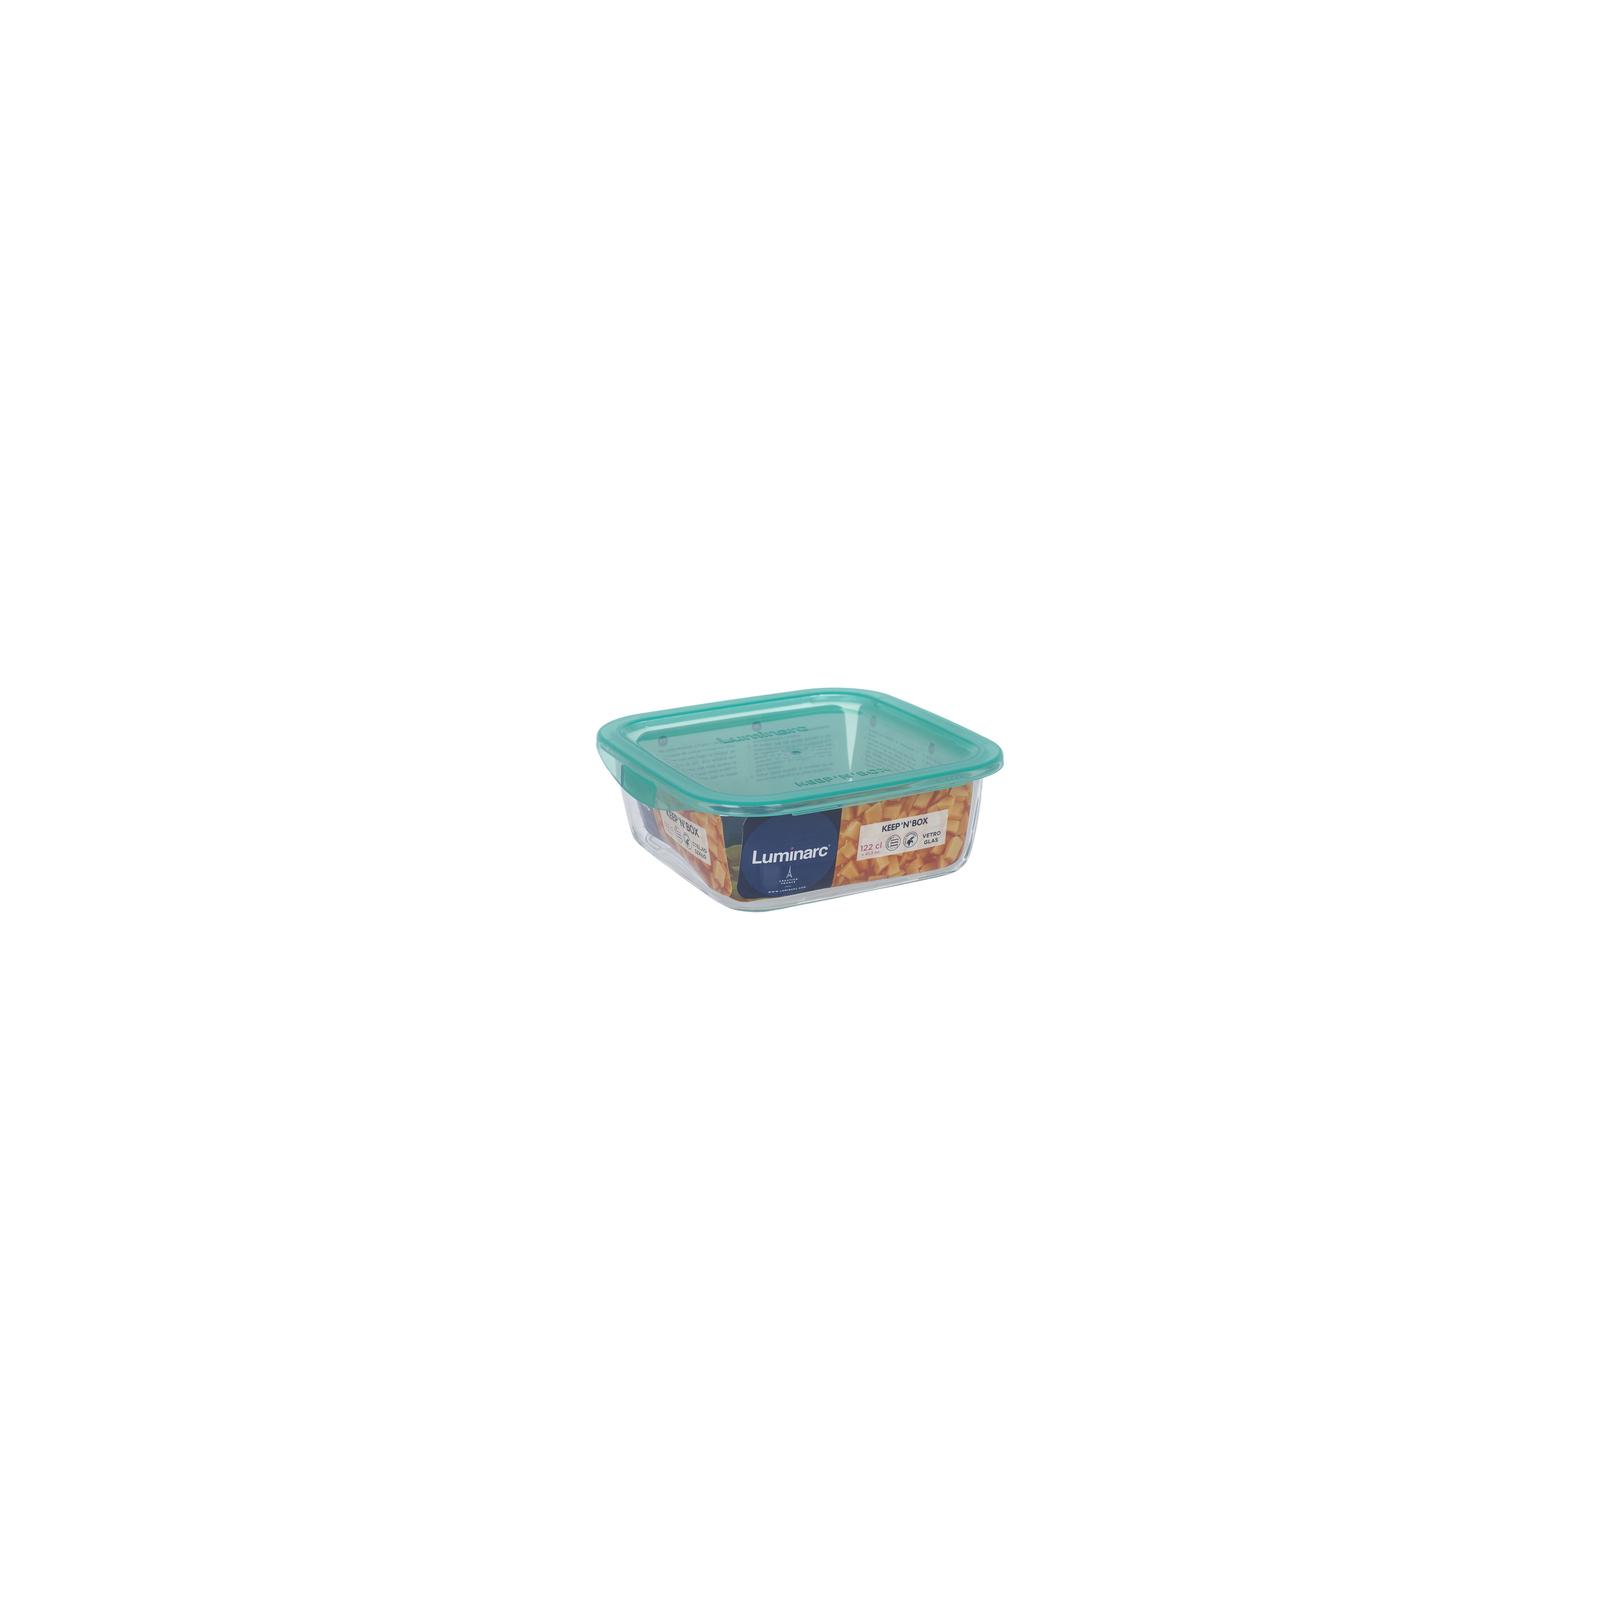 Пищевой контейнер Luminarc Keep'n Box Lagoon квадр. 1220 мл (P5520) изображение 3